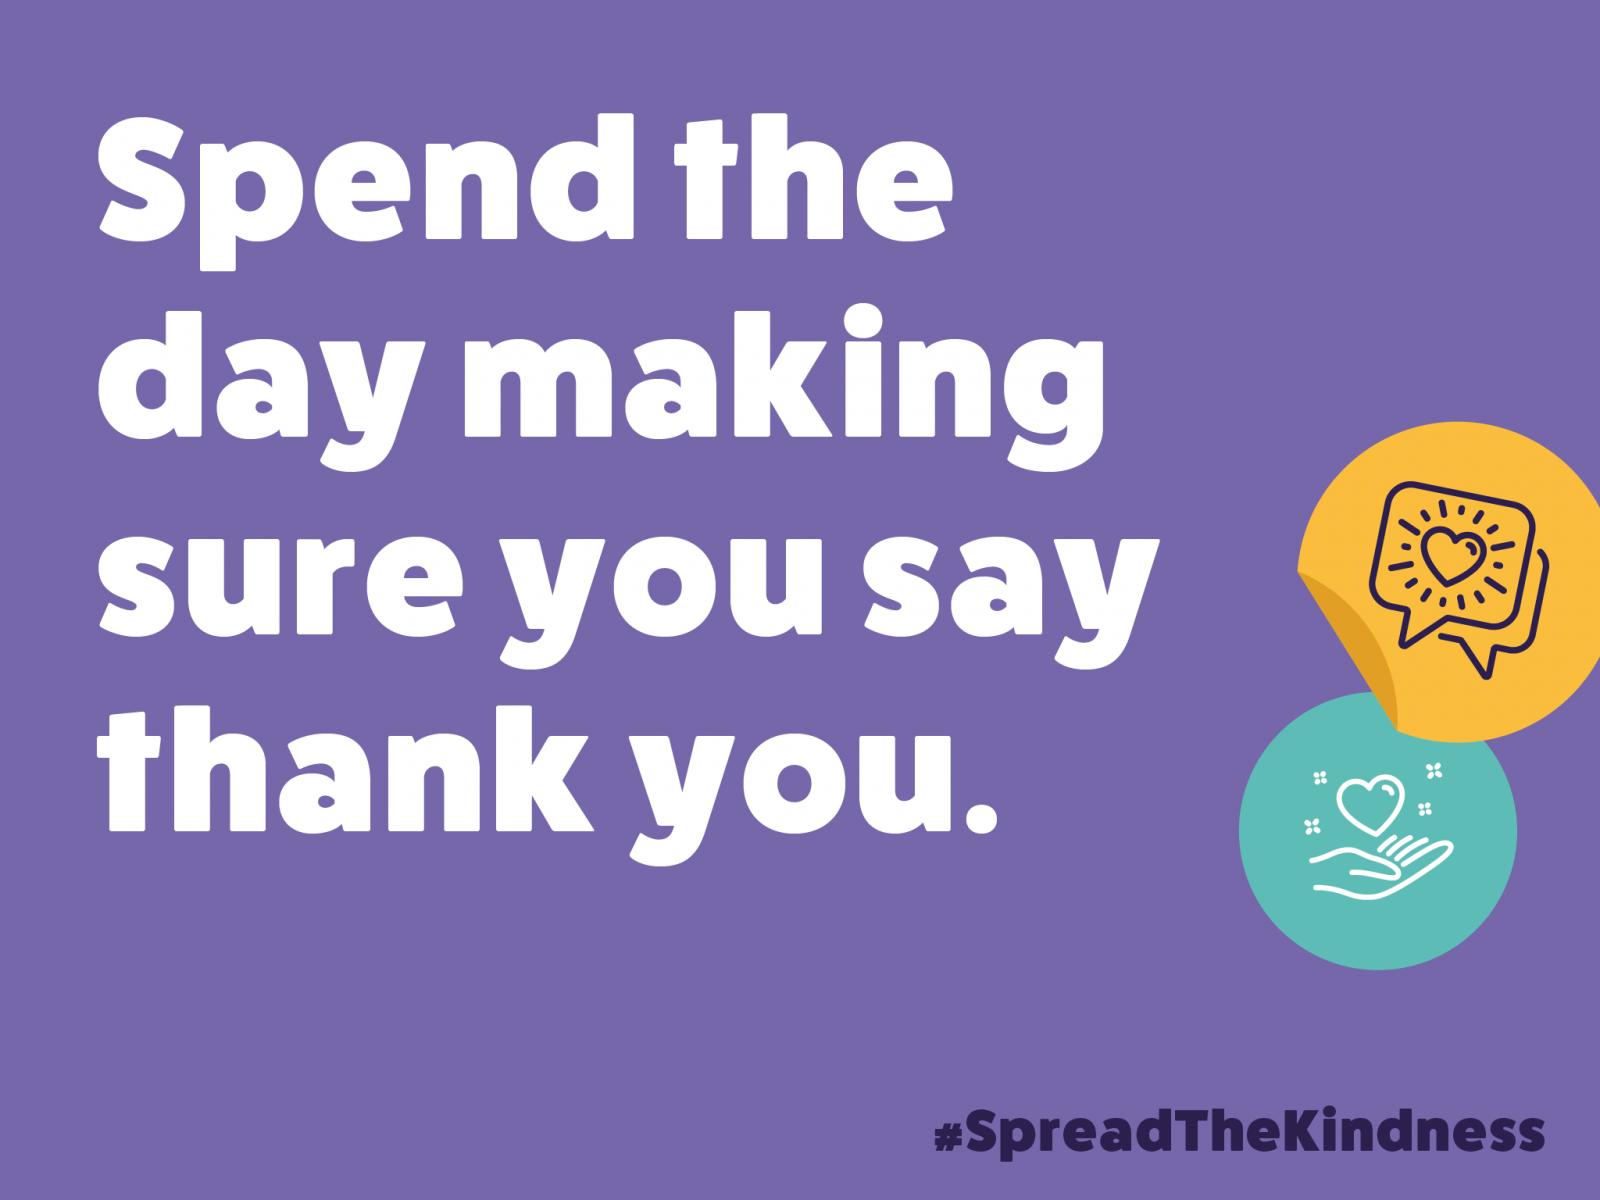 Spread-the-kindness_Plasma-screens_Standard-05